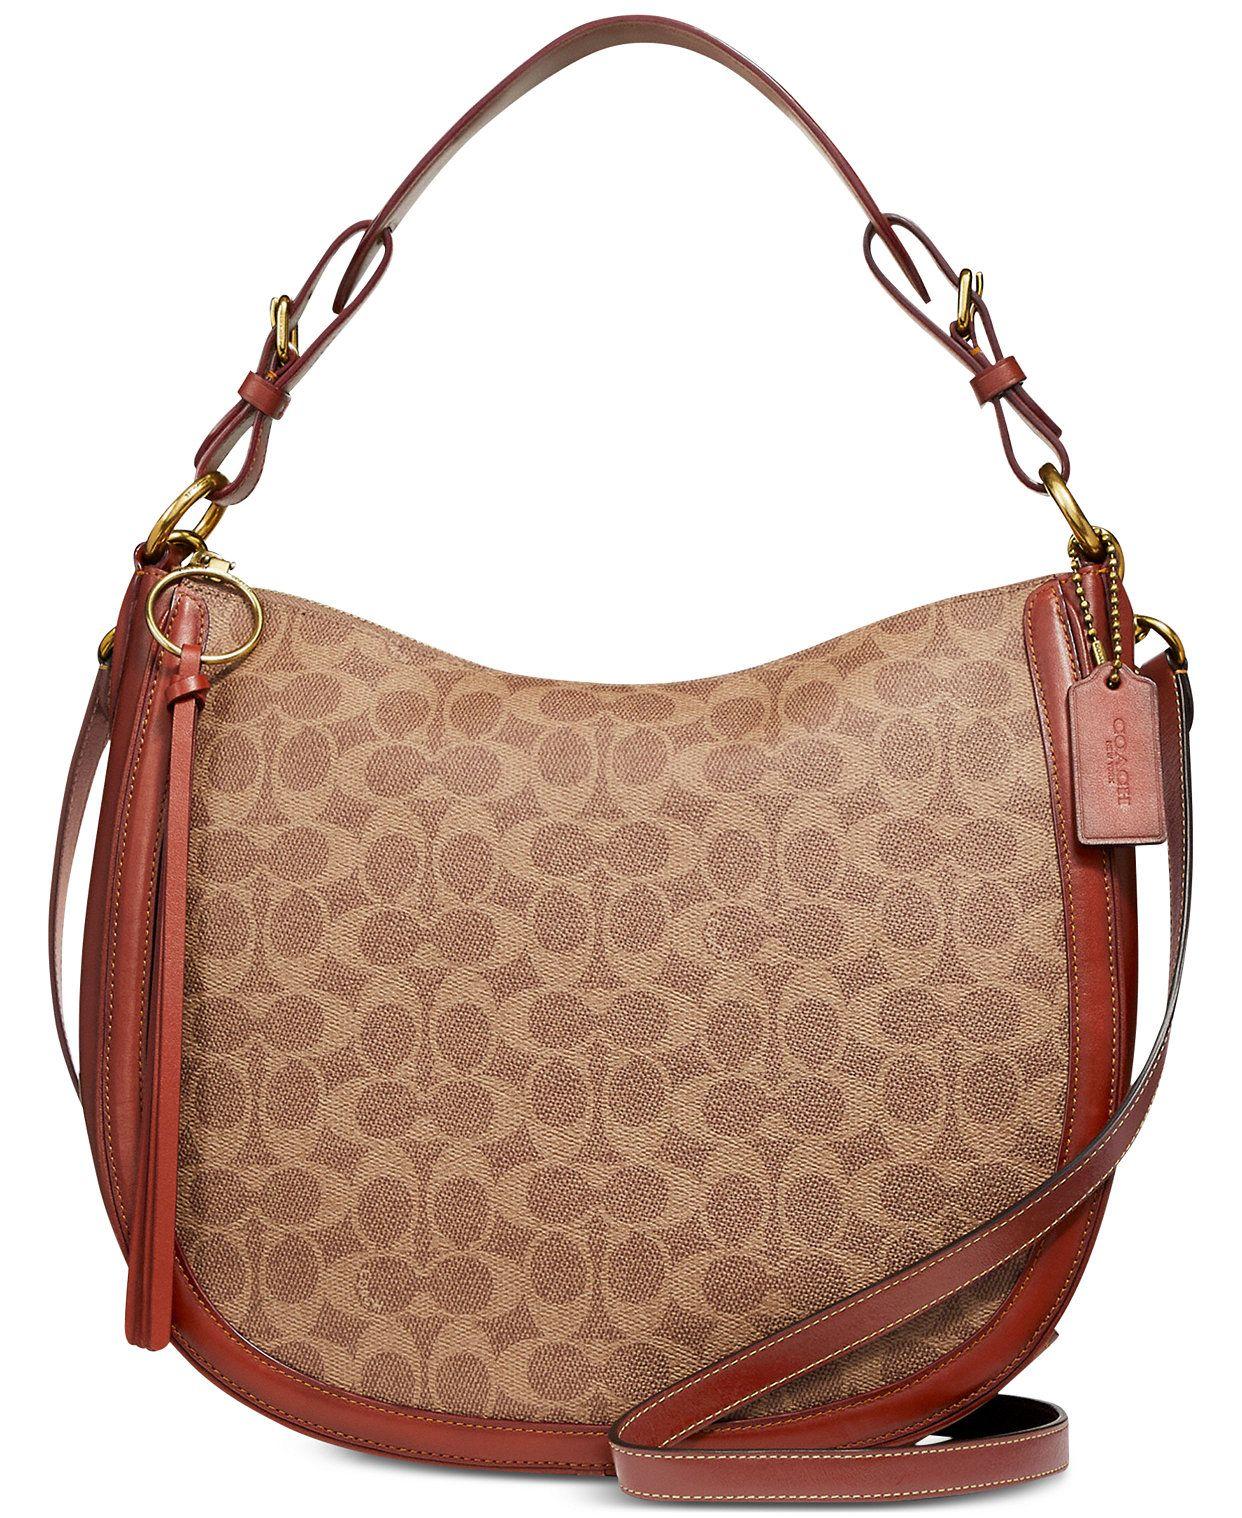 Coated Canvas Signature Sutton Hobo In 2020 Handbag Outfit Discount Authentic Designer Handbags Hobo